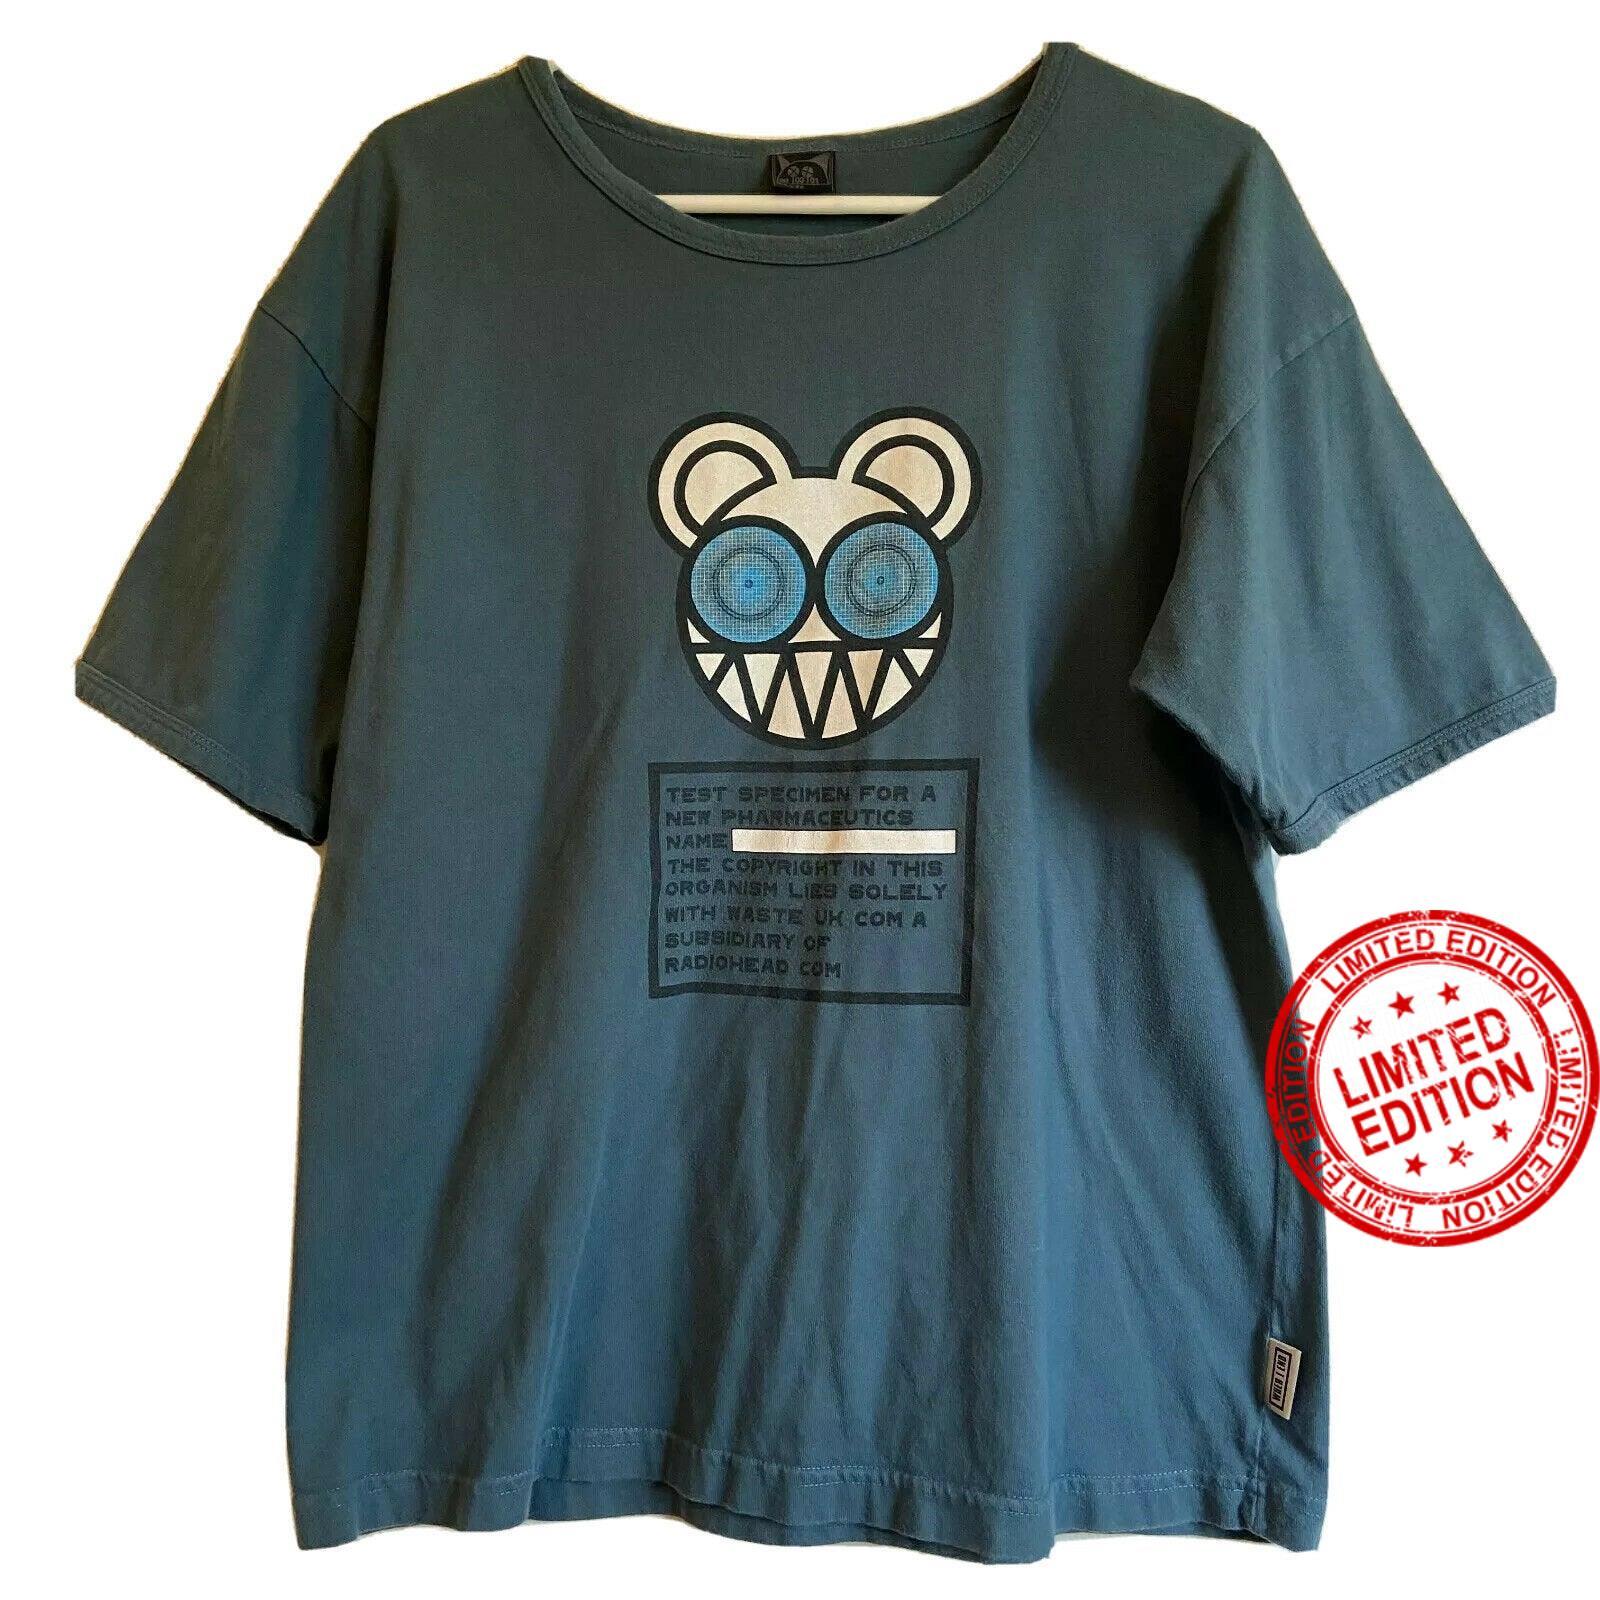 w.a.s.t.e. radiohead shirt